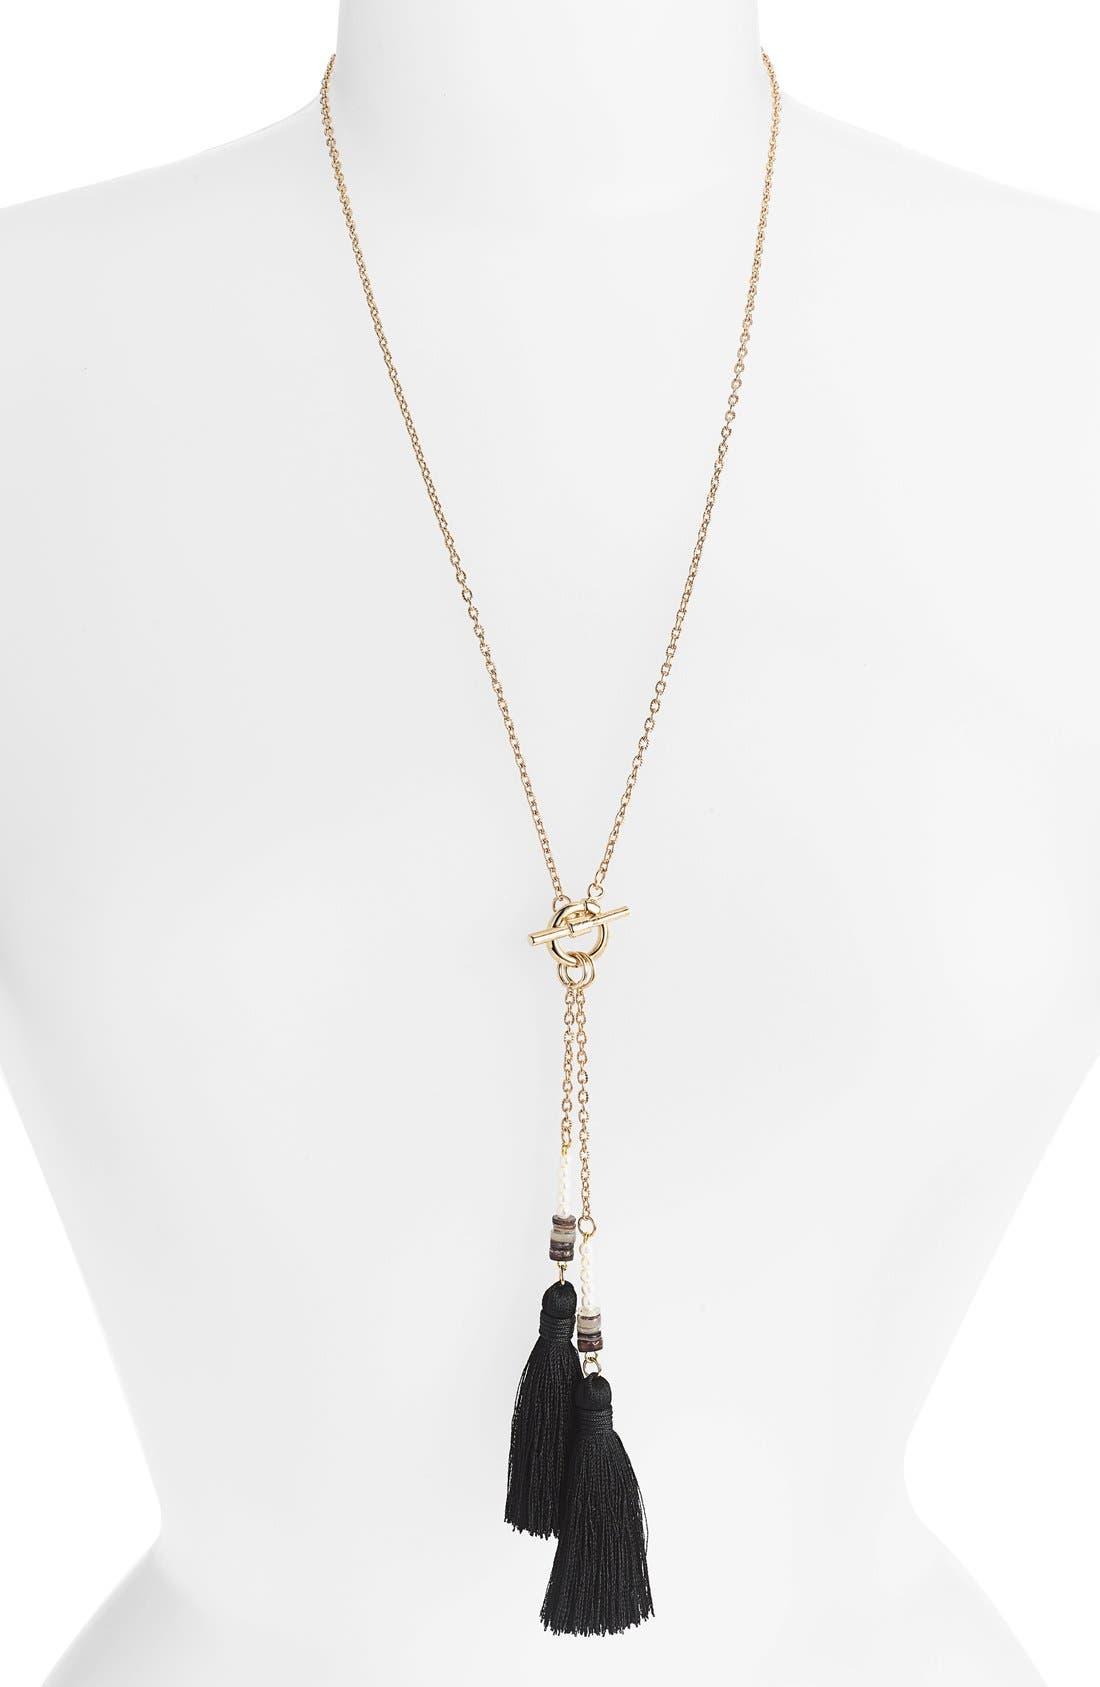 Alternate Image 1 Selected - Tildon 'Double Tassel' Pendant Necklace